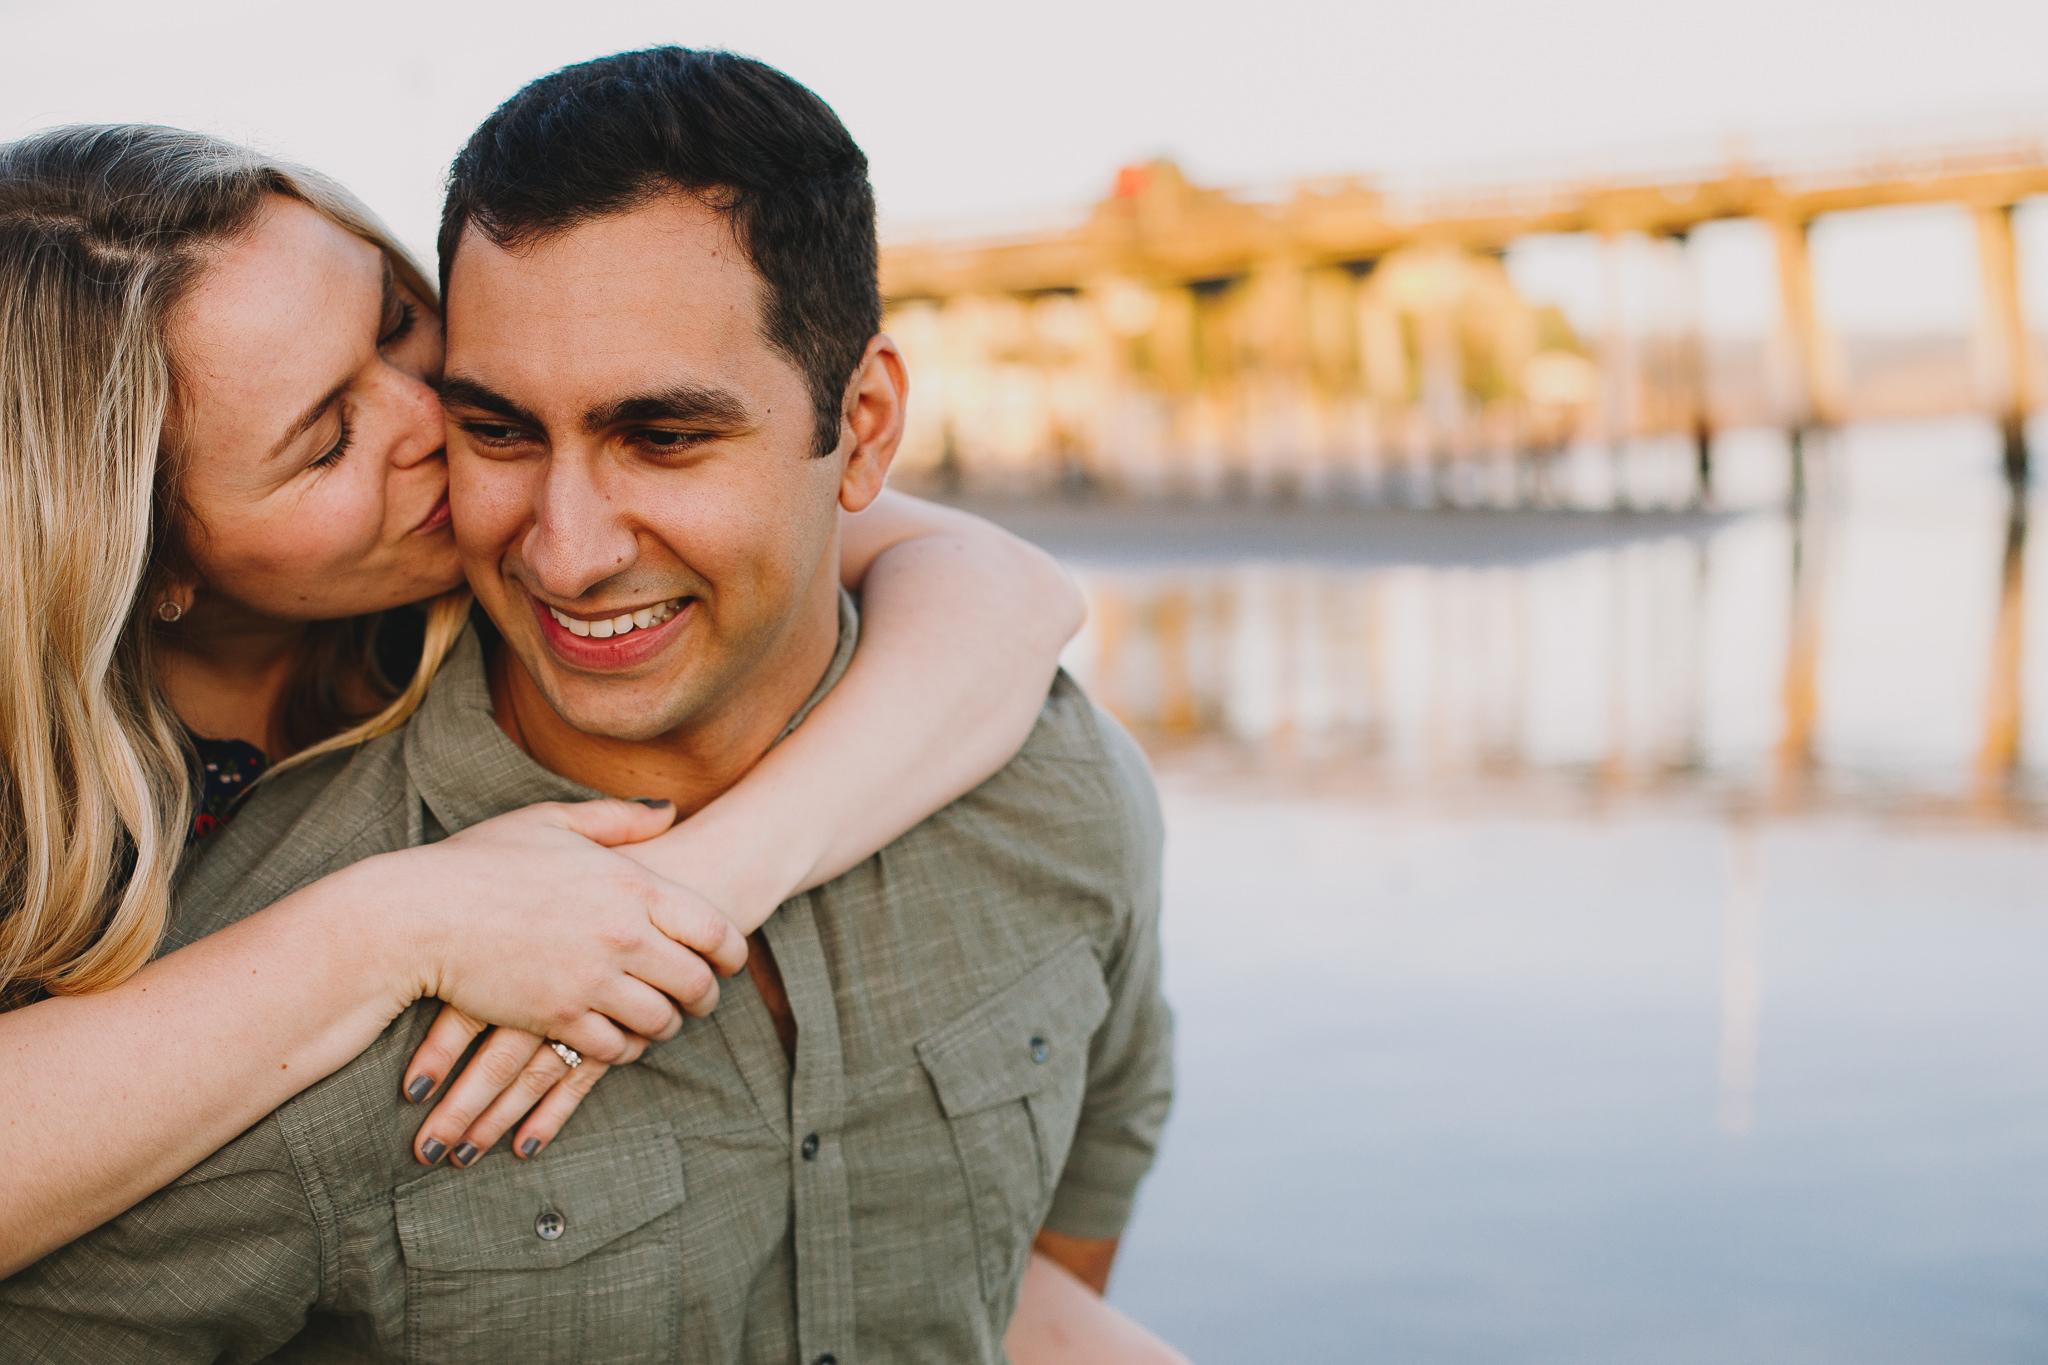 Archer Inspired Photography Capitola Beach Santa Cruz Wedding Engagement Lifestyle Session Photographer-110.jpg